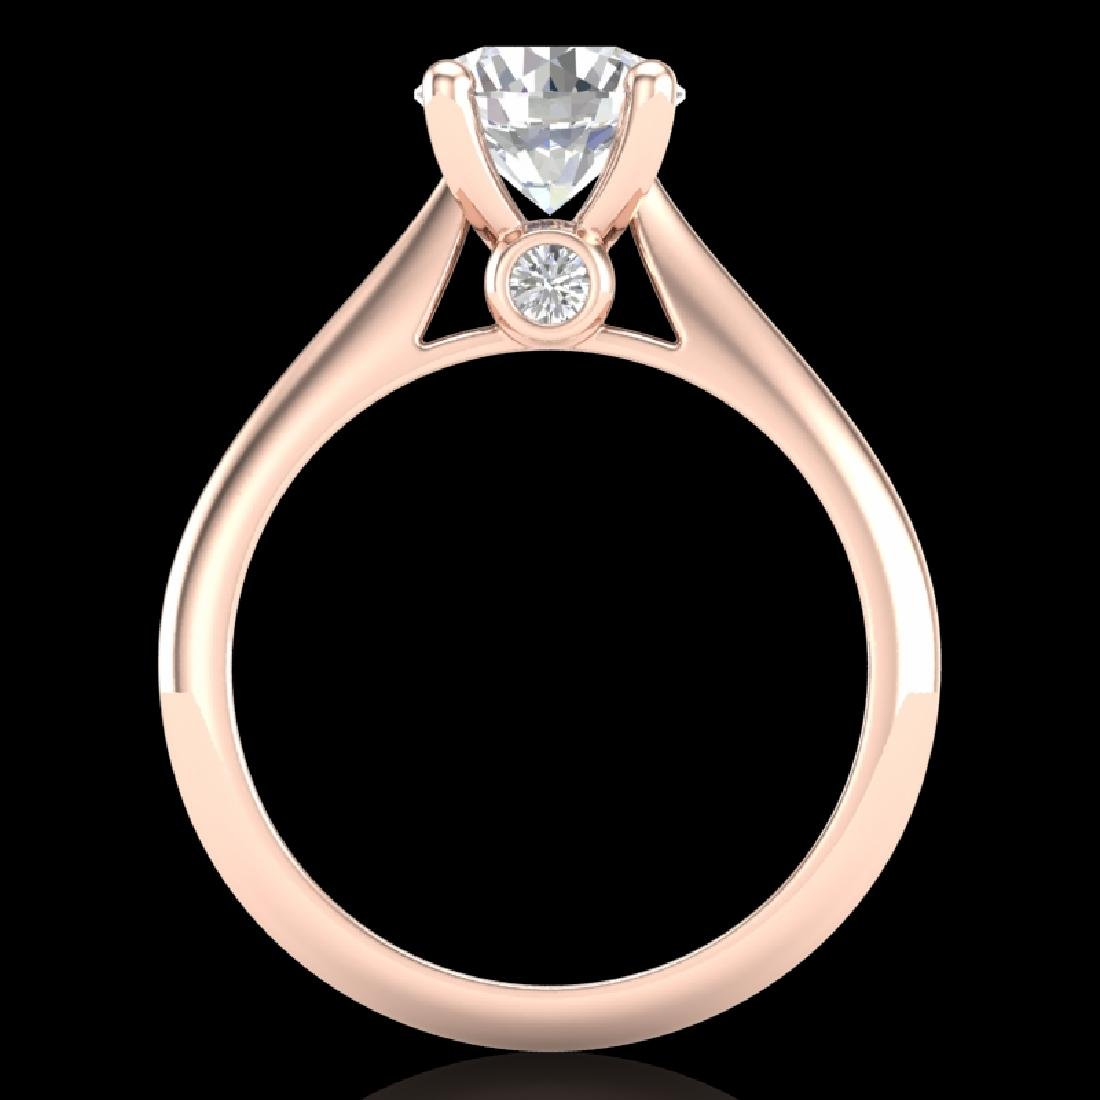 1.6 CTW VS/SI Diamond Art Deco Ring 18K Rose Gold - 2